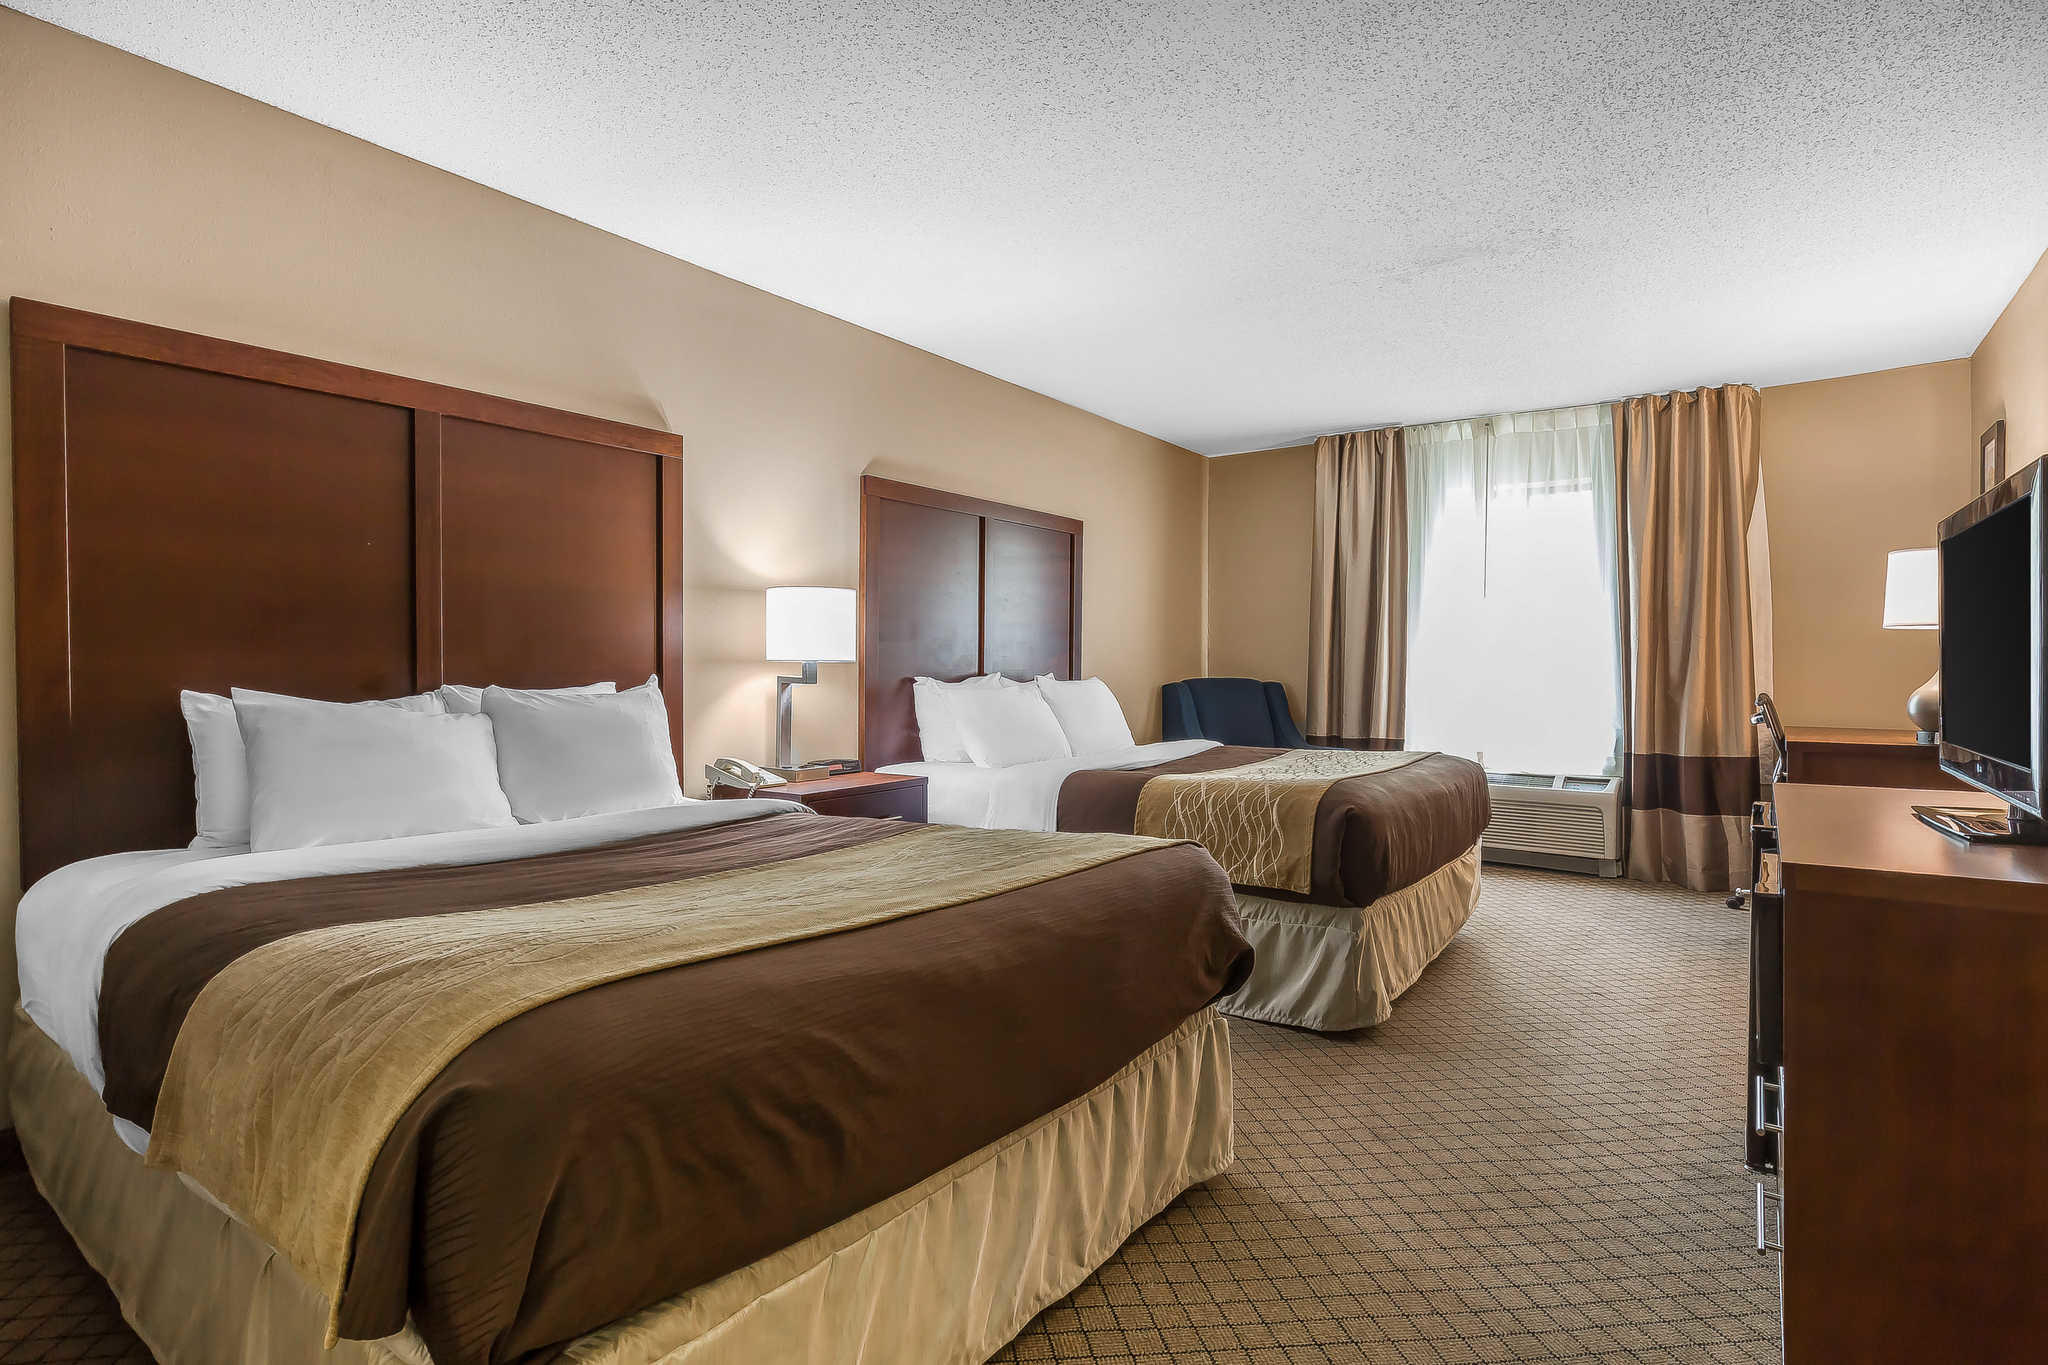 Comfort Inn Amp Suites Mishawaka Indiana In